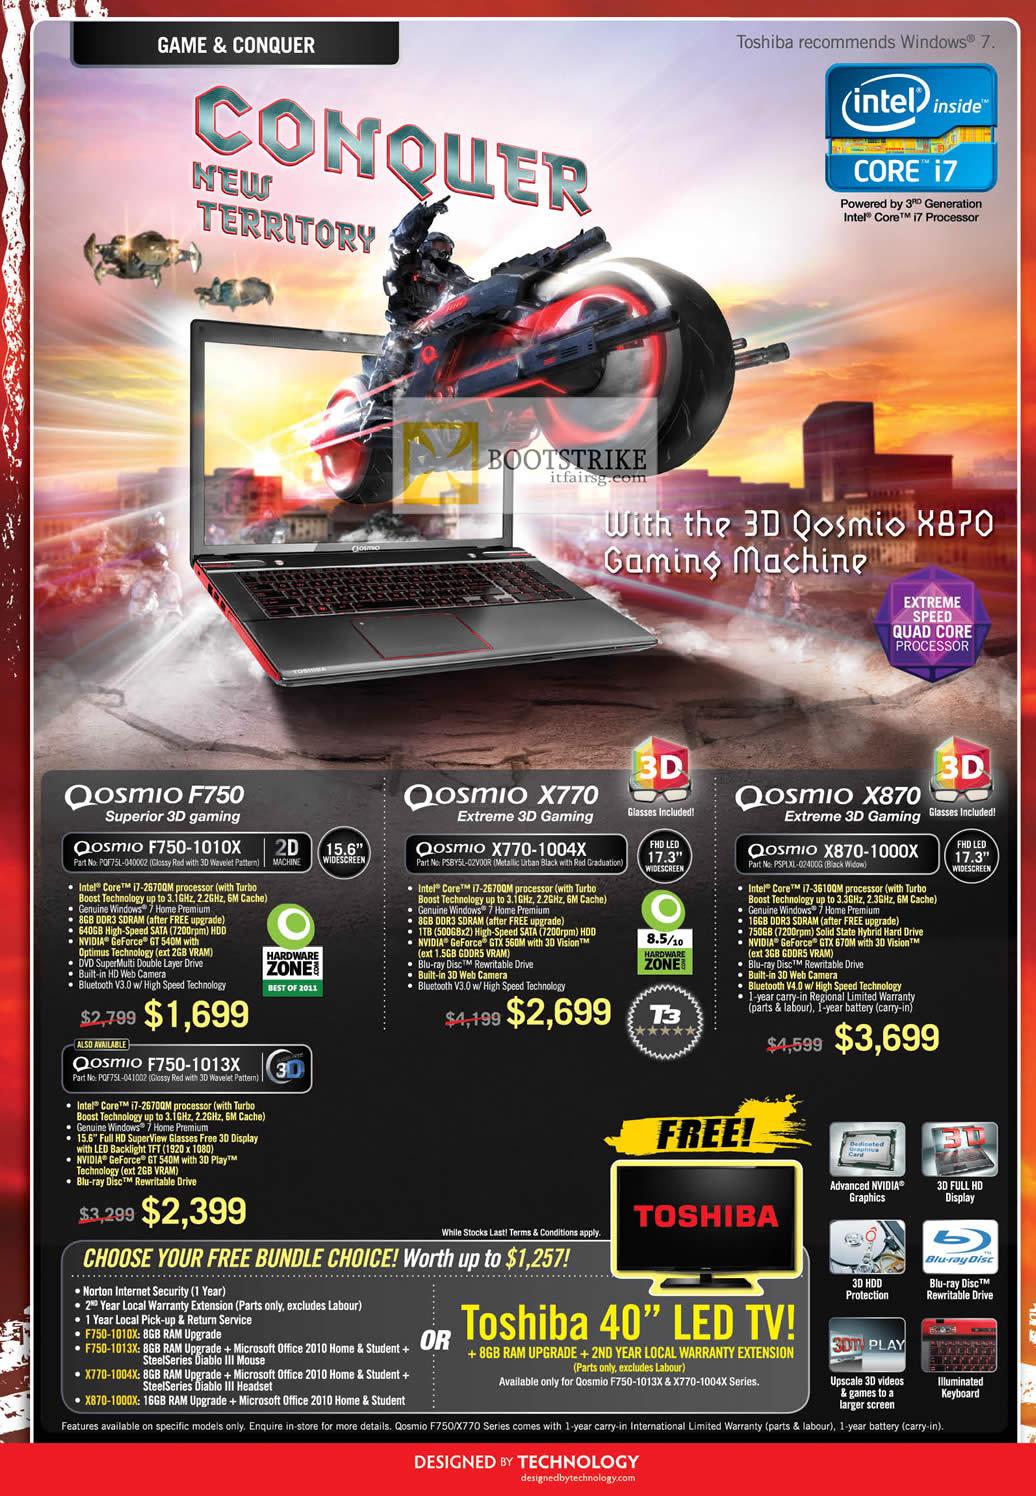 COMEX 2012 price list image brochure of Toshiba Notebooks Gaming Qosmio F750-1010X 1013X, X770-1004X, X870-1000X